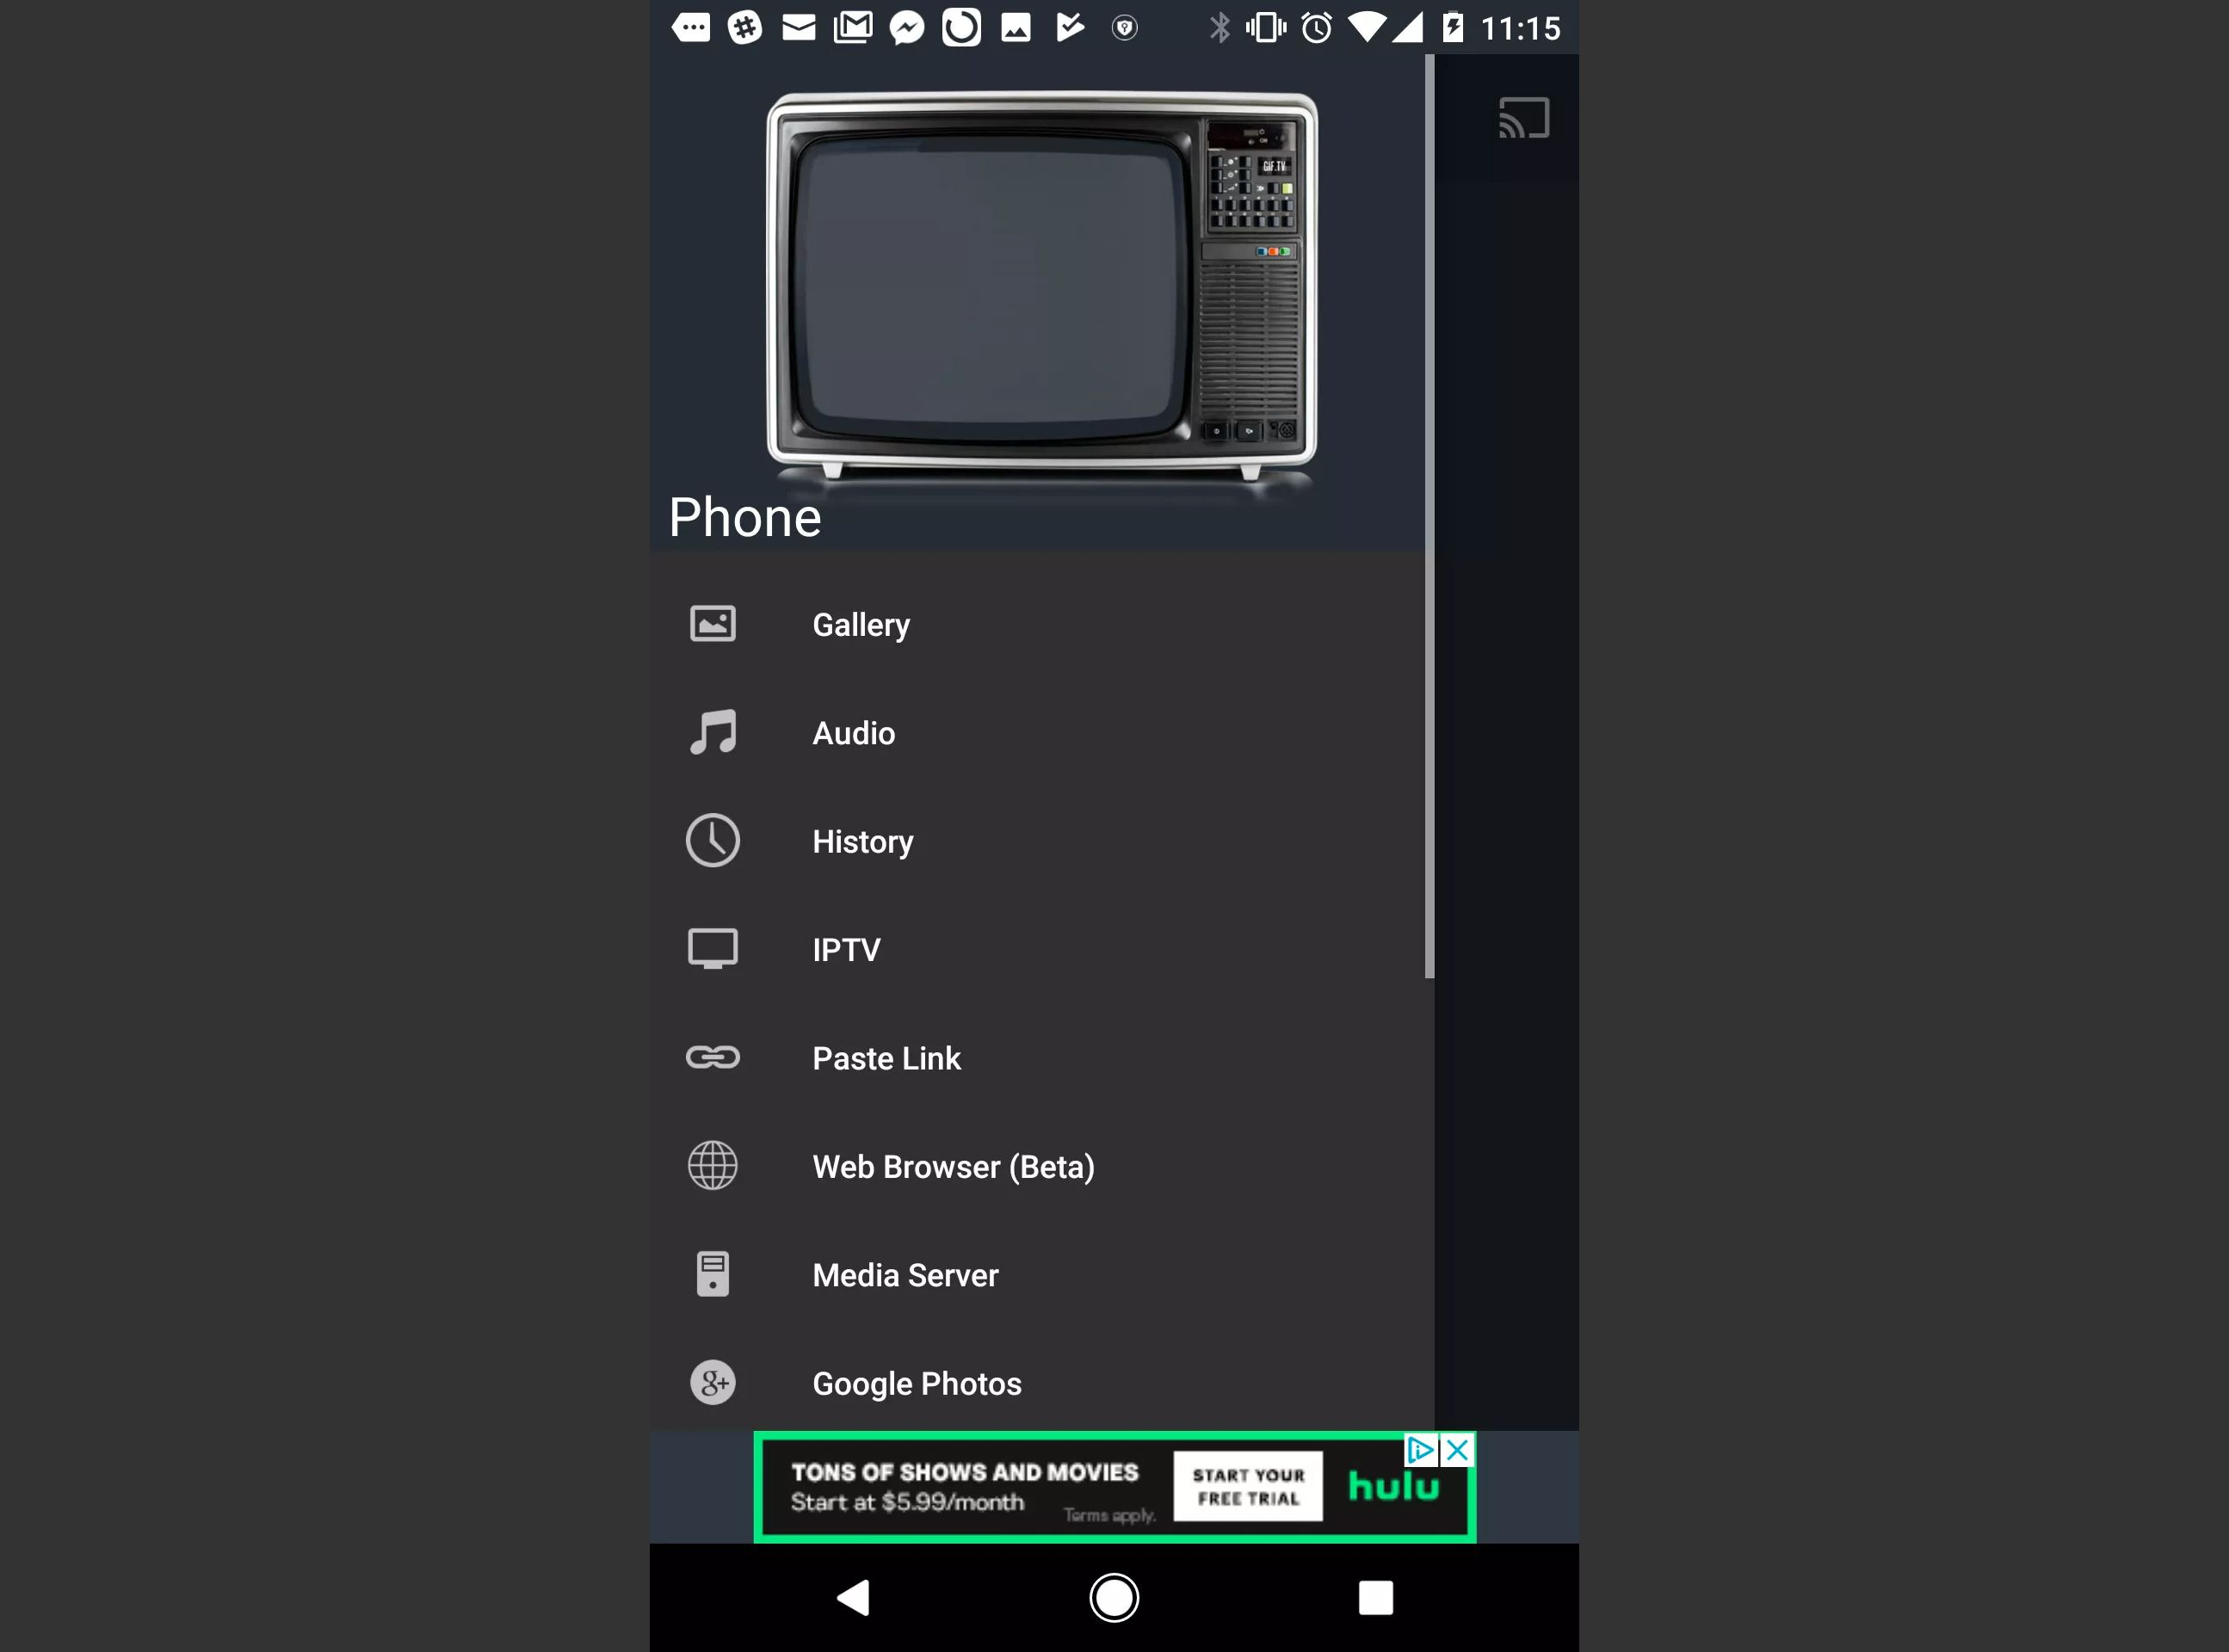 The All Screen menu